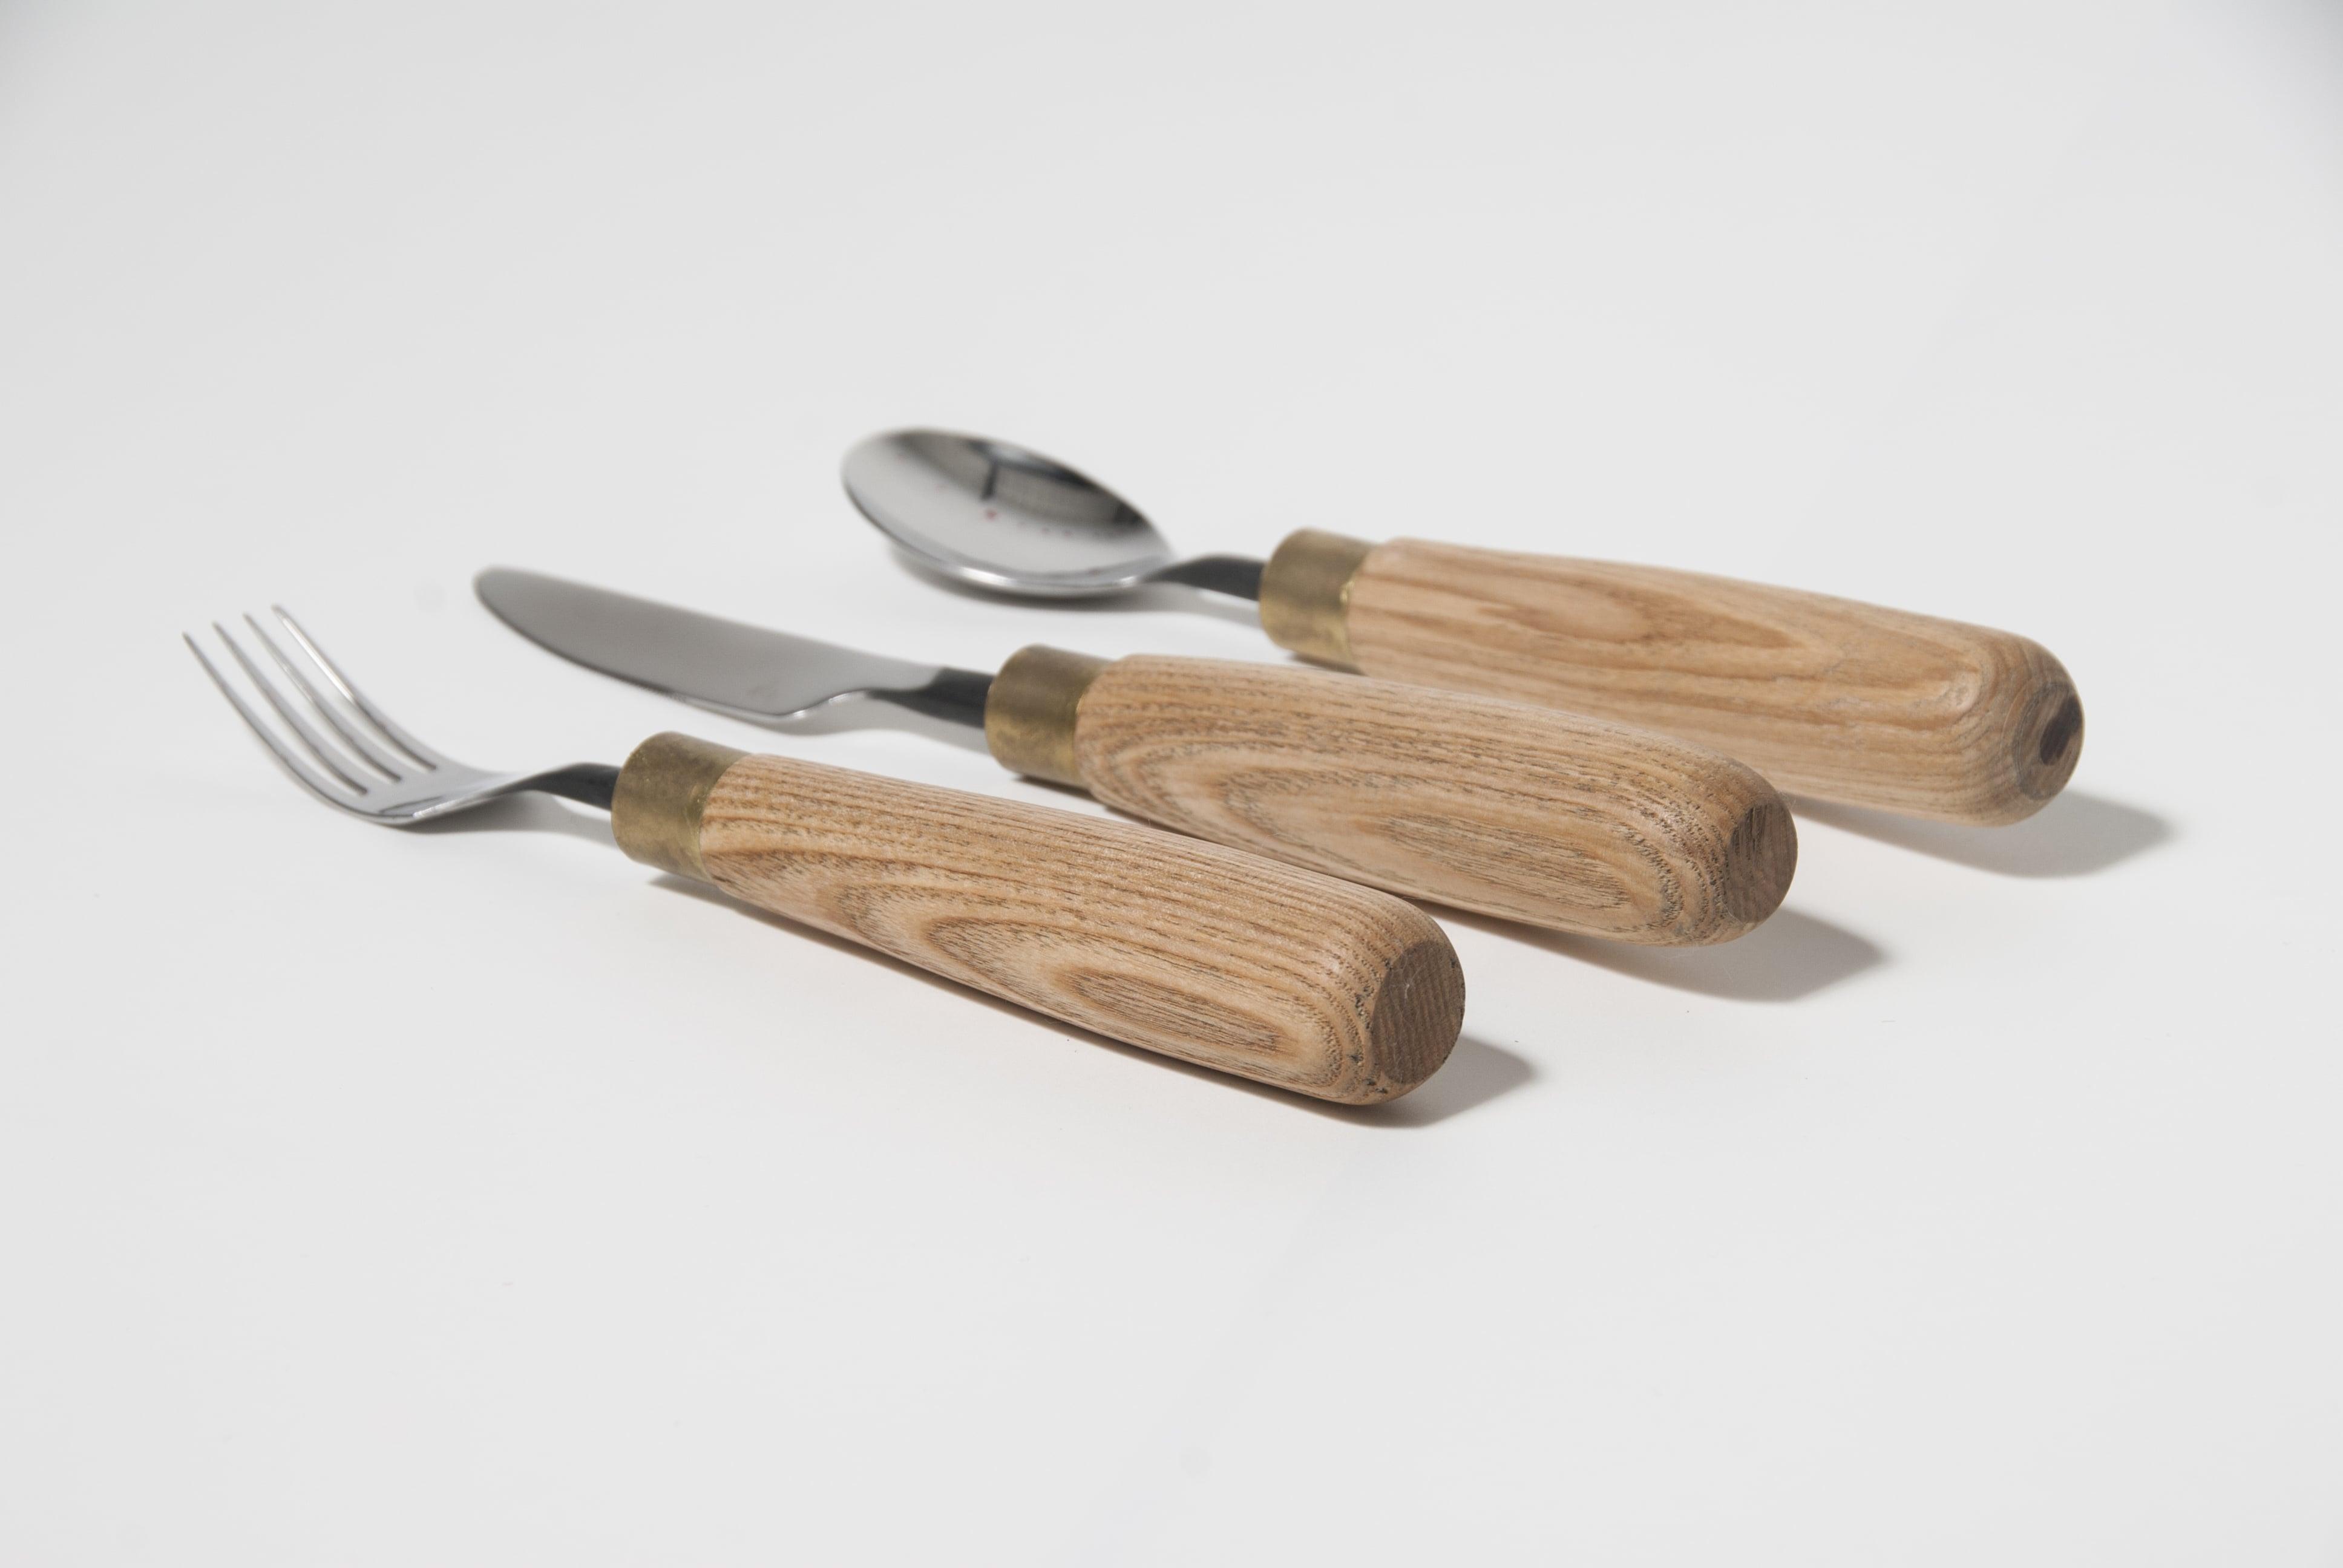 garden-tools-cutlery